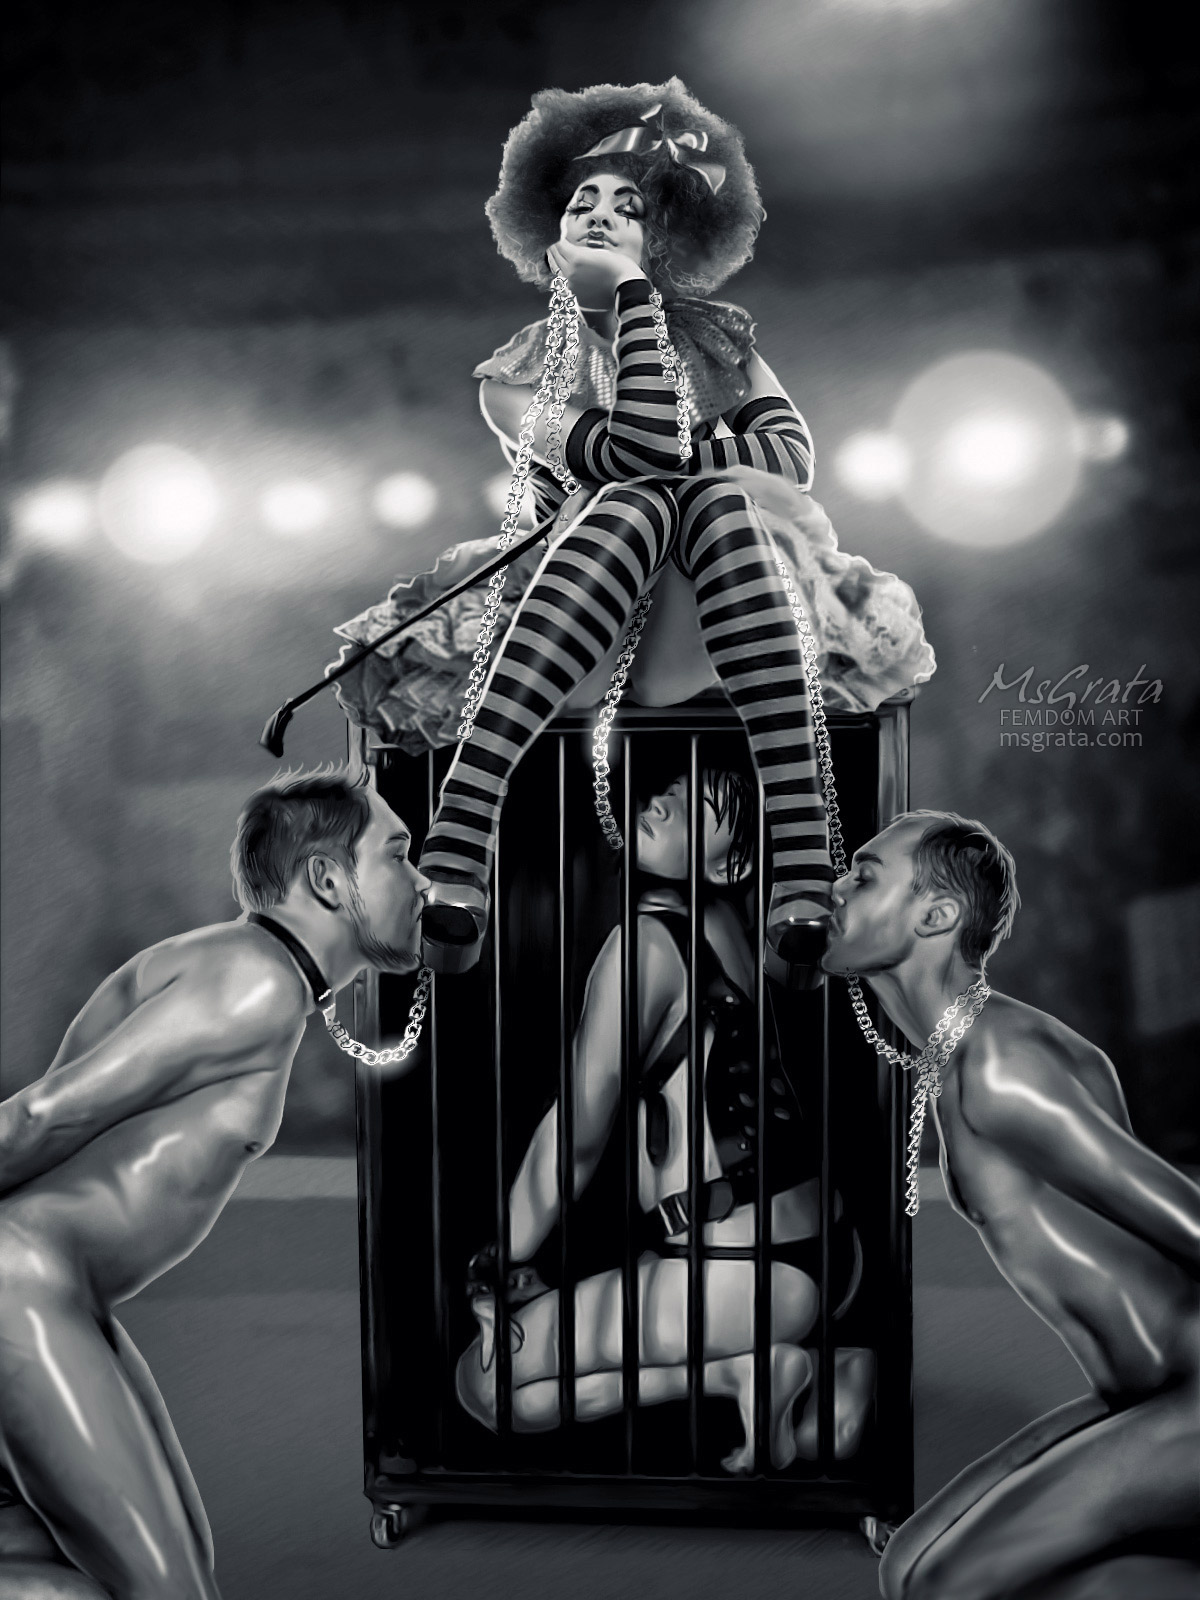 Circus Performance feet worship femdom art drawn by MsGrata